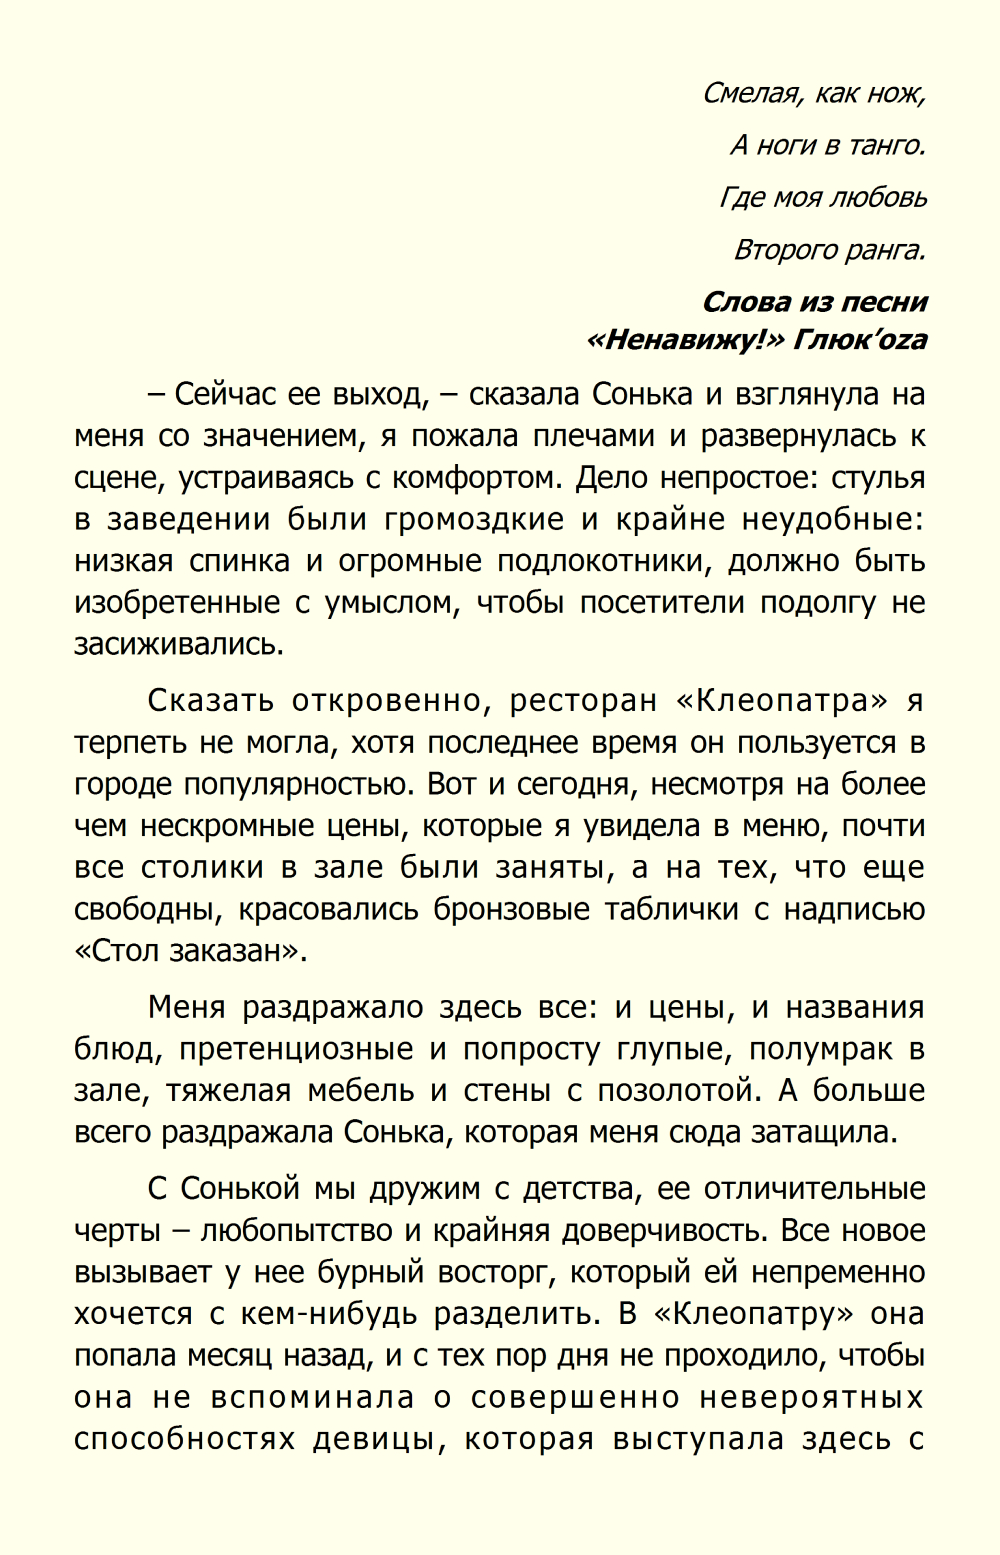 http://i1.imageban.ru/out/2013/10/04/3a14757d7d55fb8dfcf51d09a4bdb4c0.jpg